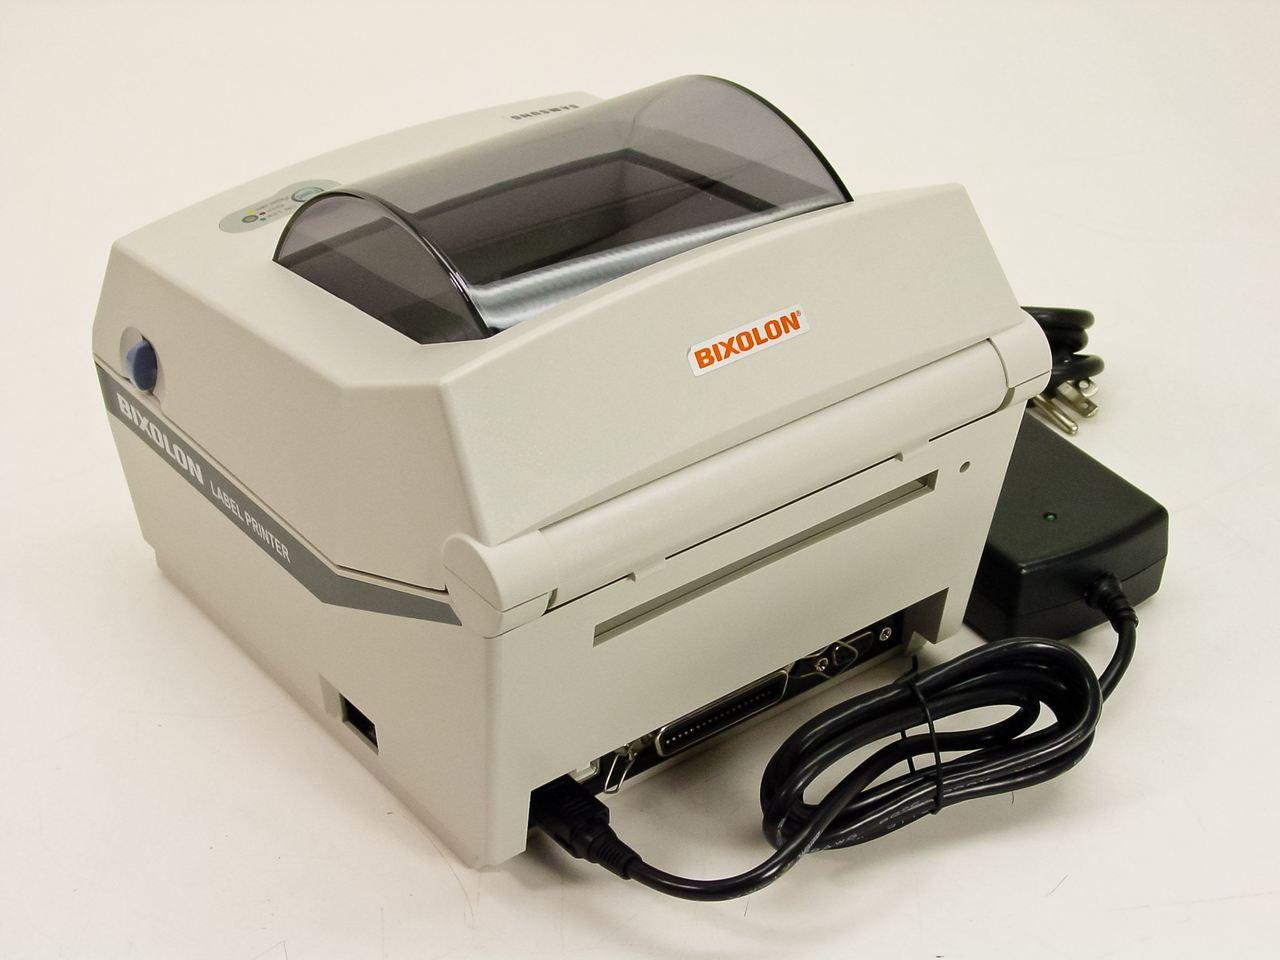 Samsung Thermal Label Printer (BIXOLON SRP-770II)